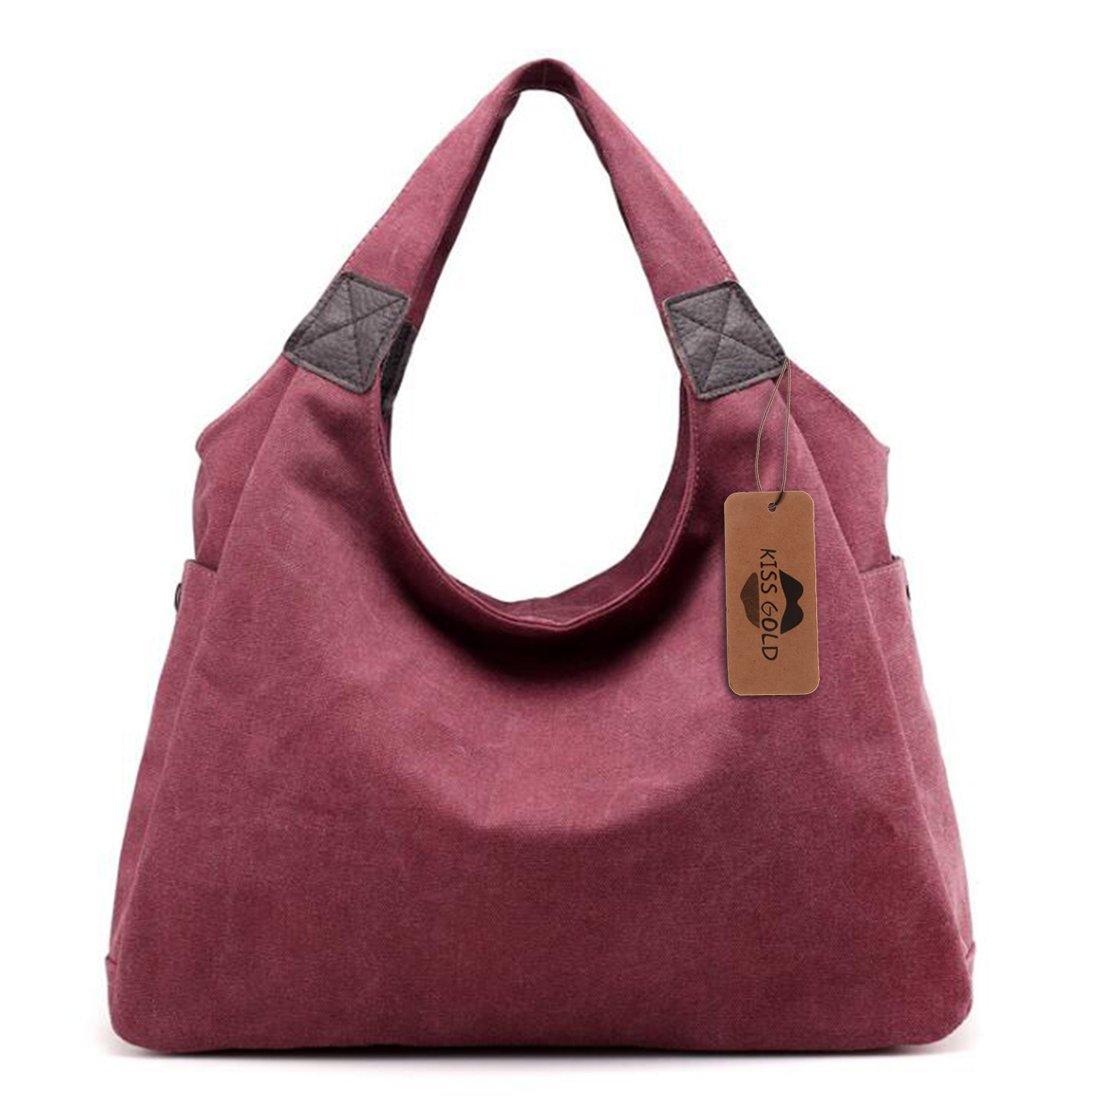 KISS GOLD(TM) Simple Style Canvas Tote Hobo Bag Shopper Handbag For Womens, Model B-Purlish Red